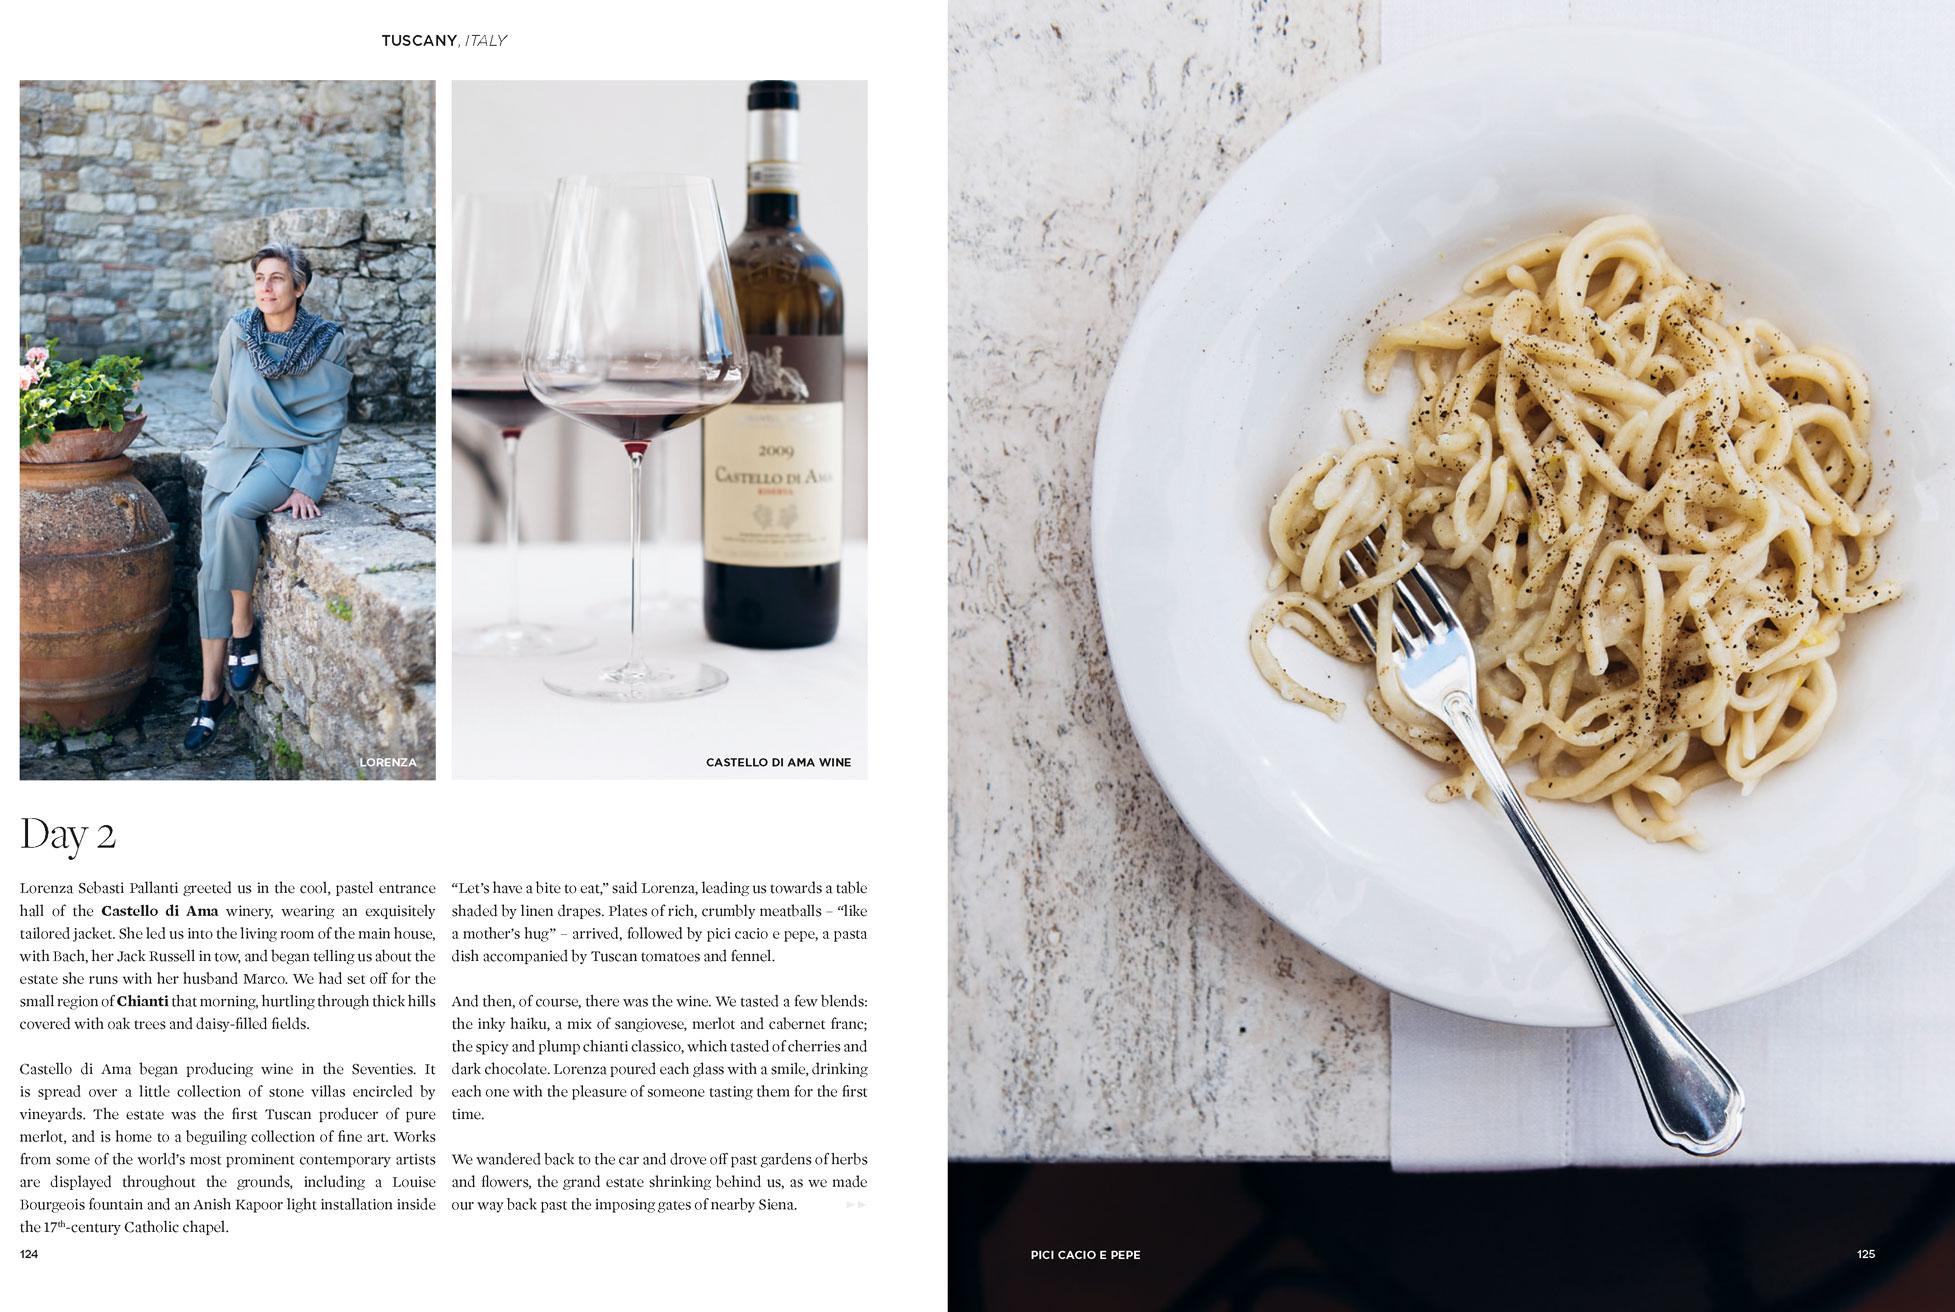 Tuscany-Wine-Tour-3.jpg